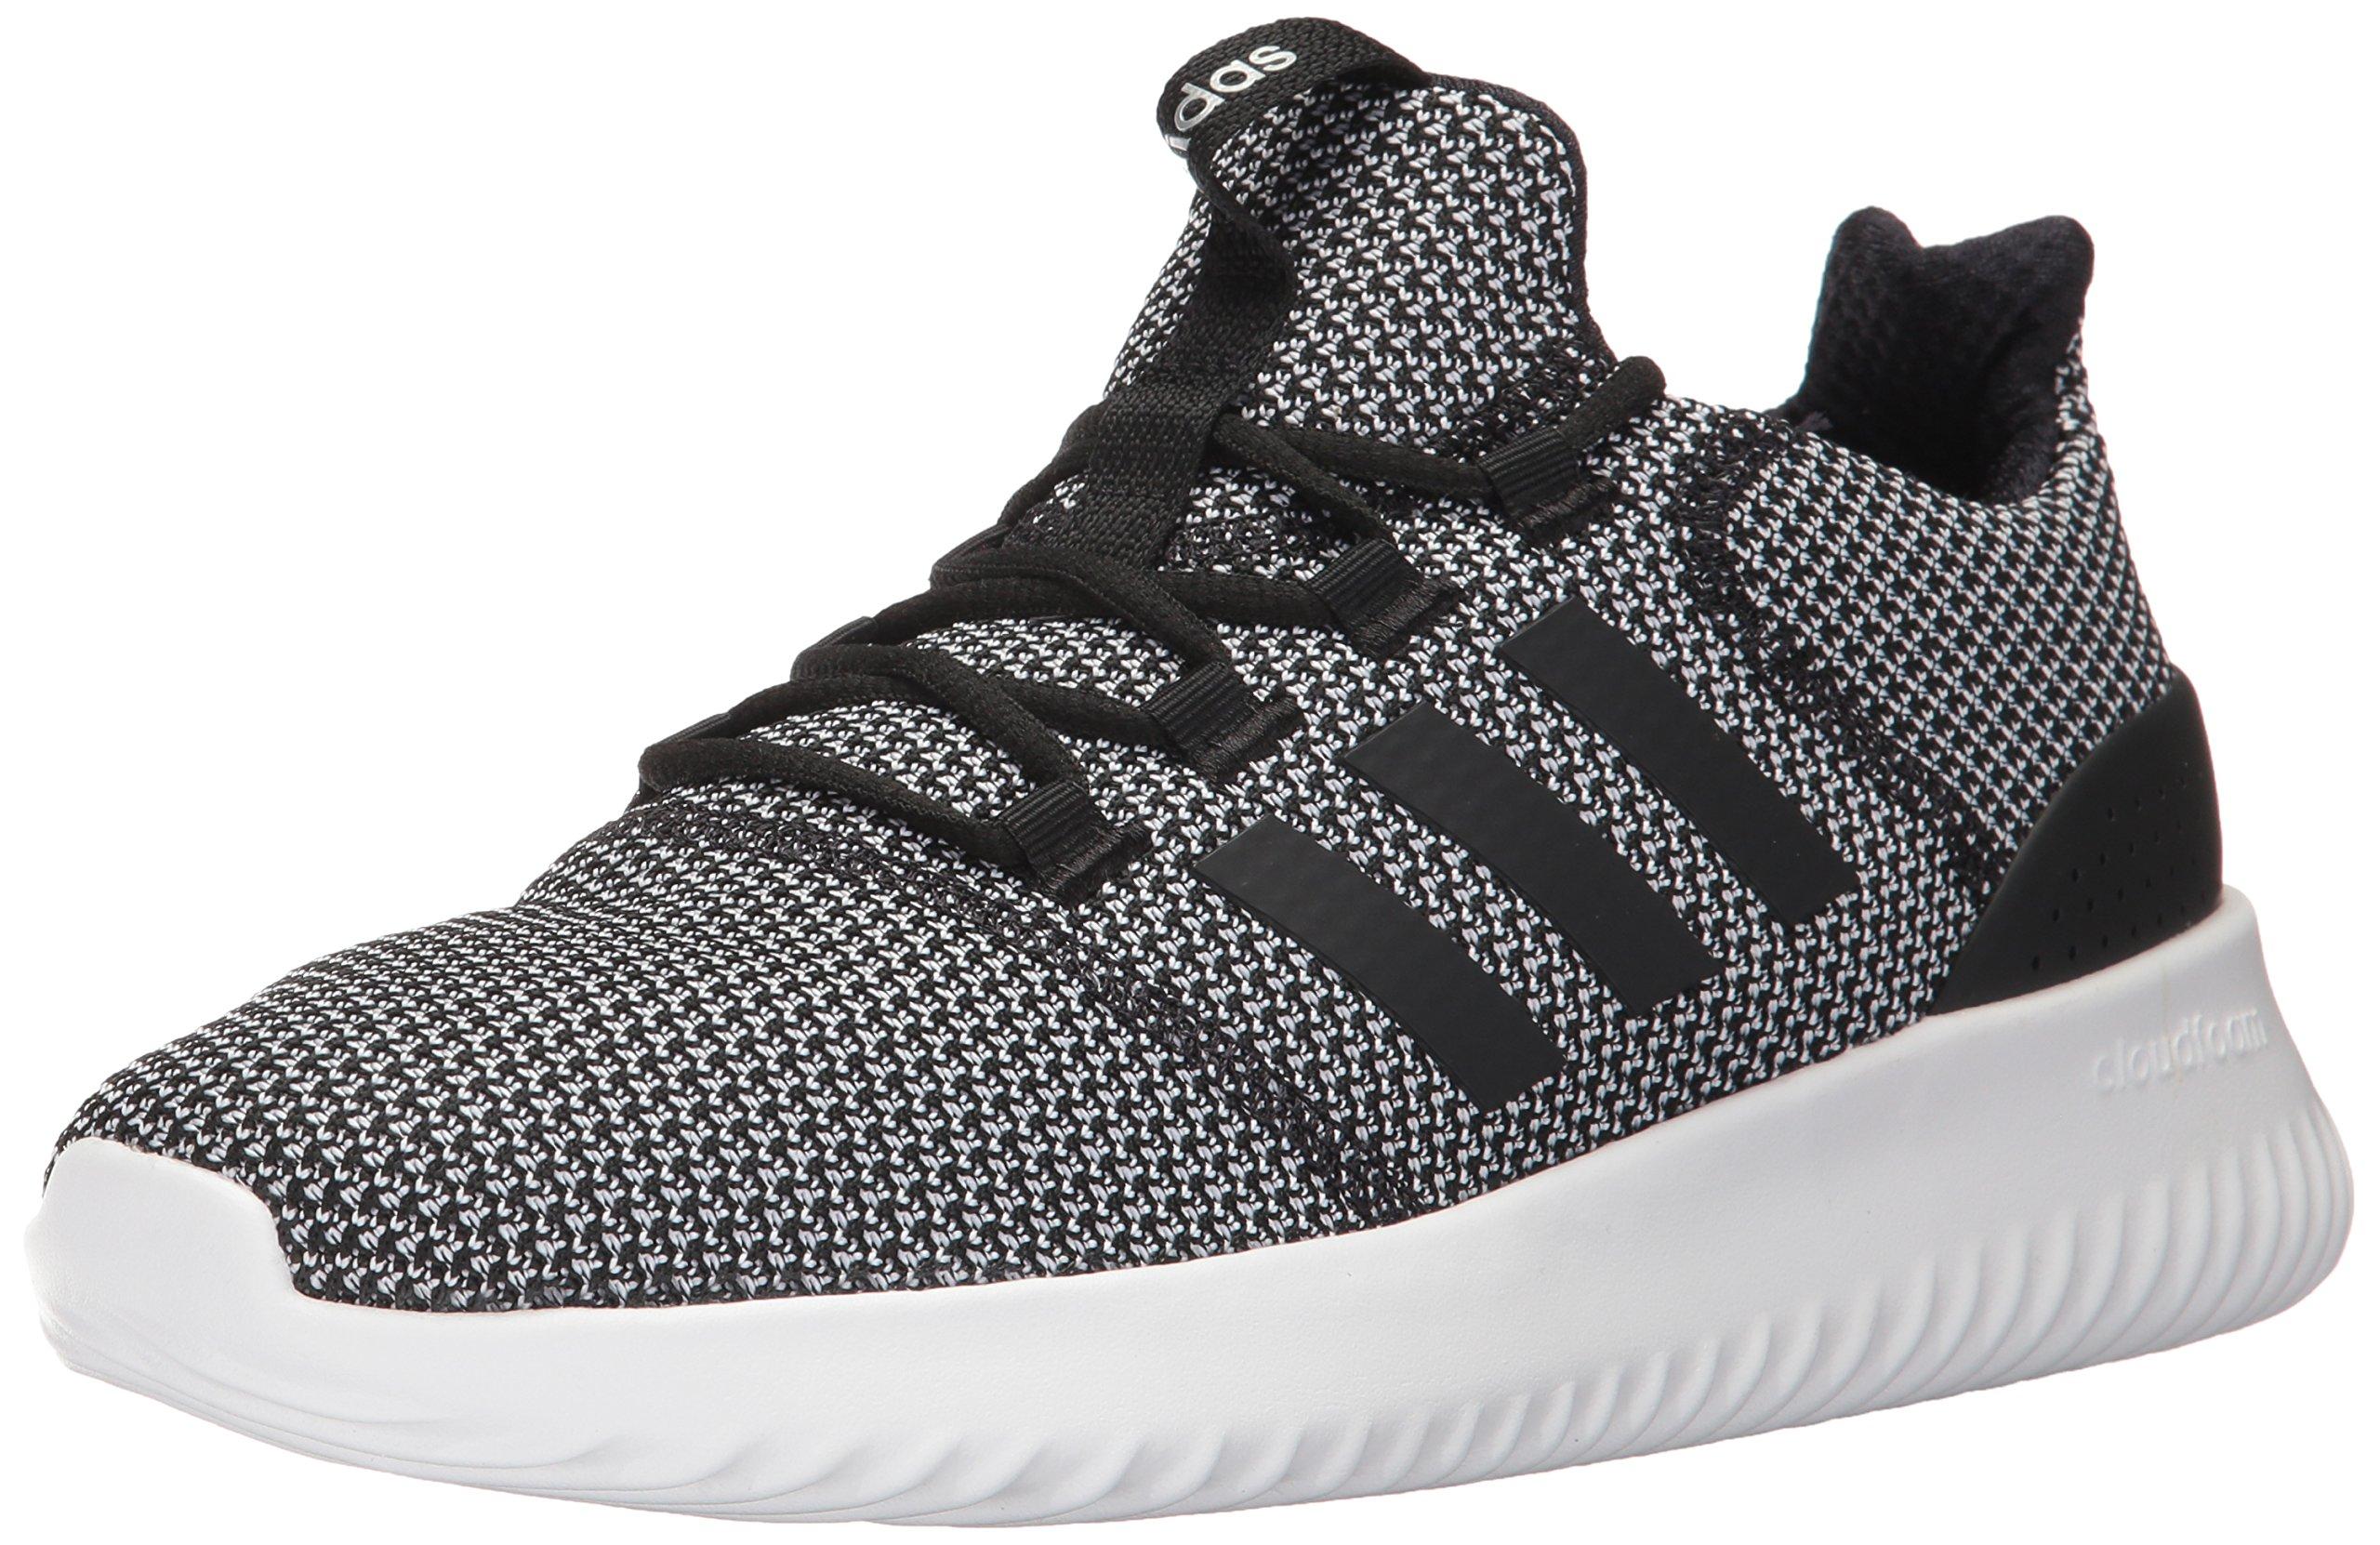 adidas Men's Cloudfoam Ultimate Running Shoe Black/White, 4 Medium US